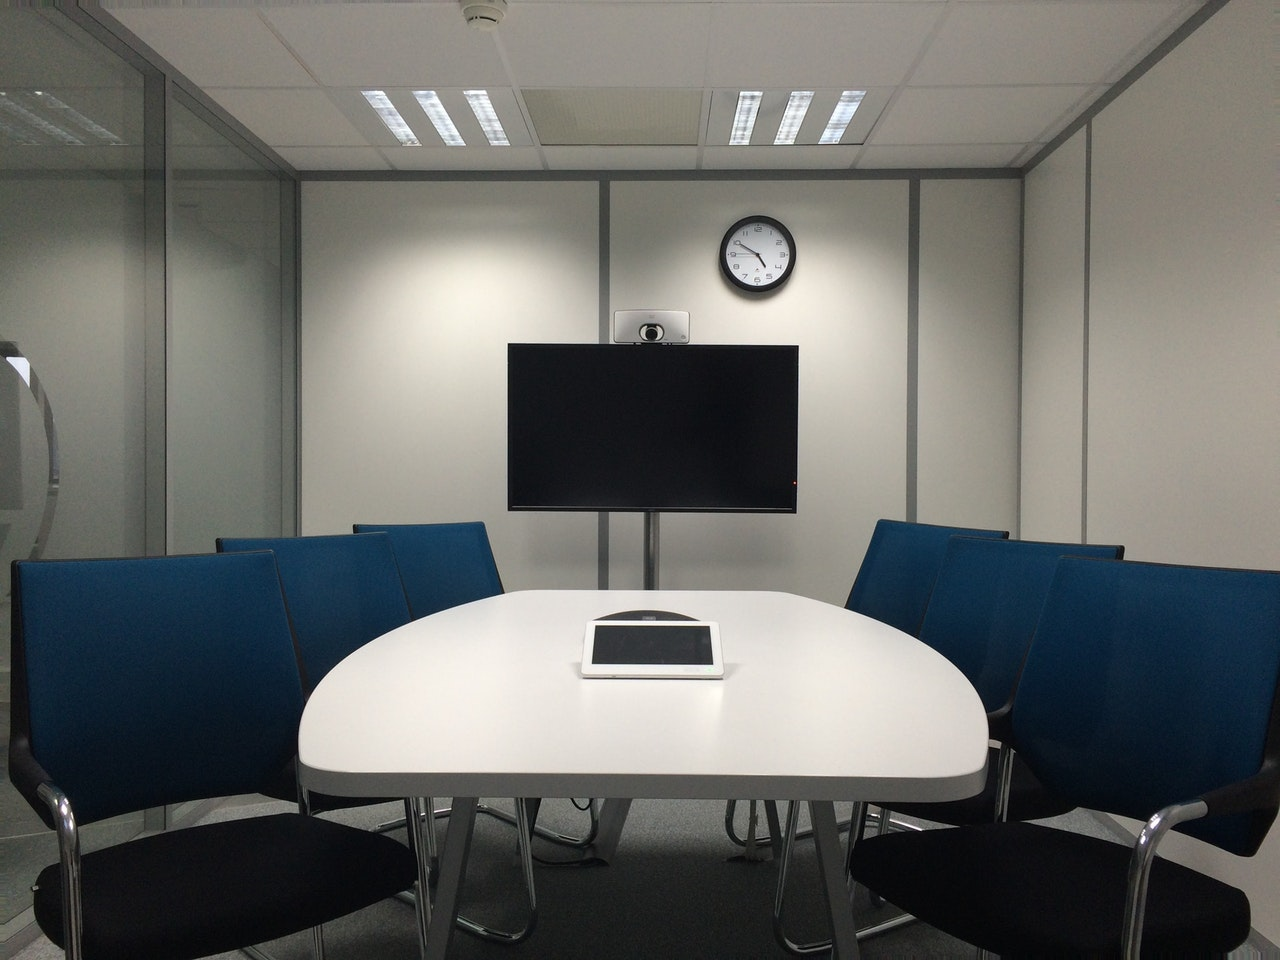 conference room-banner-image